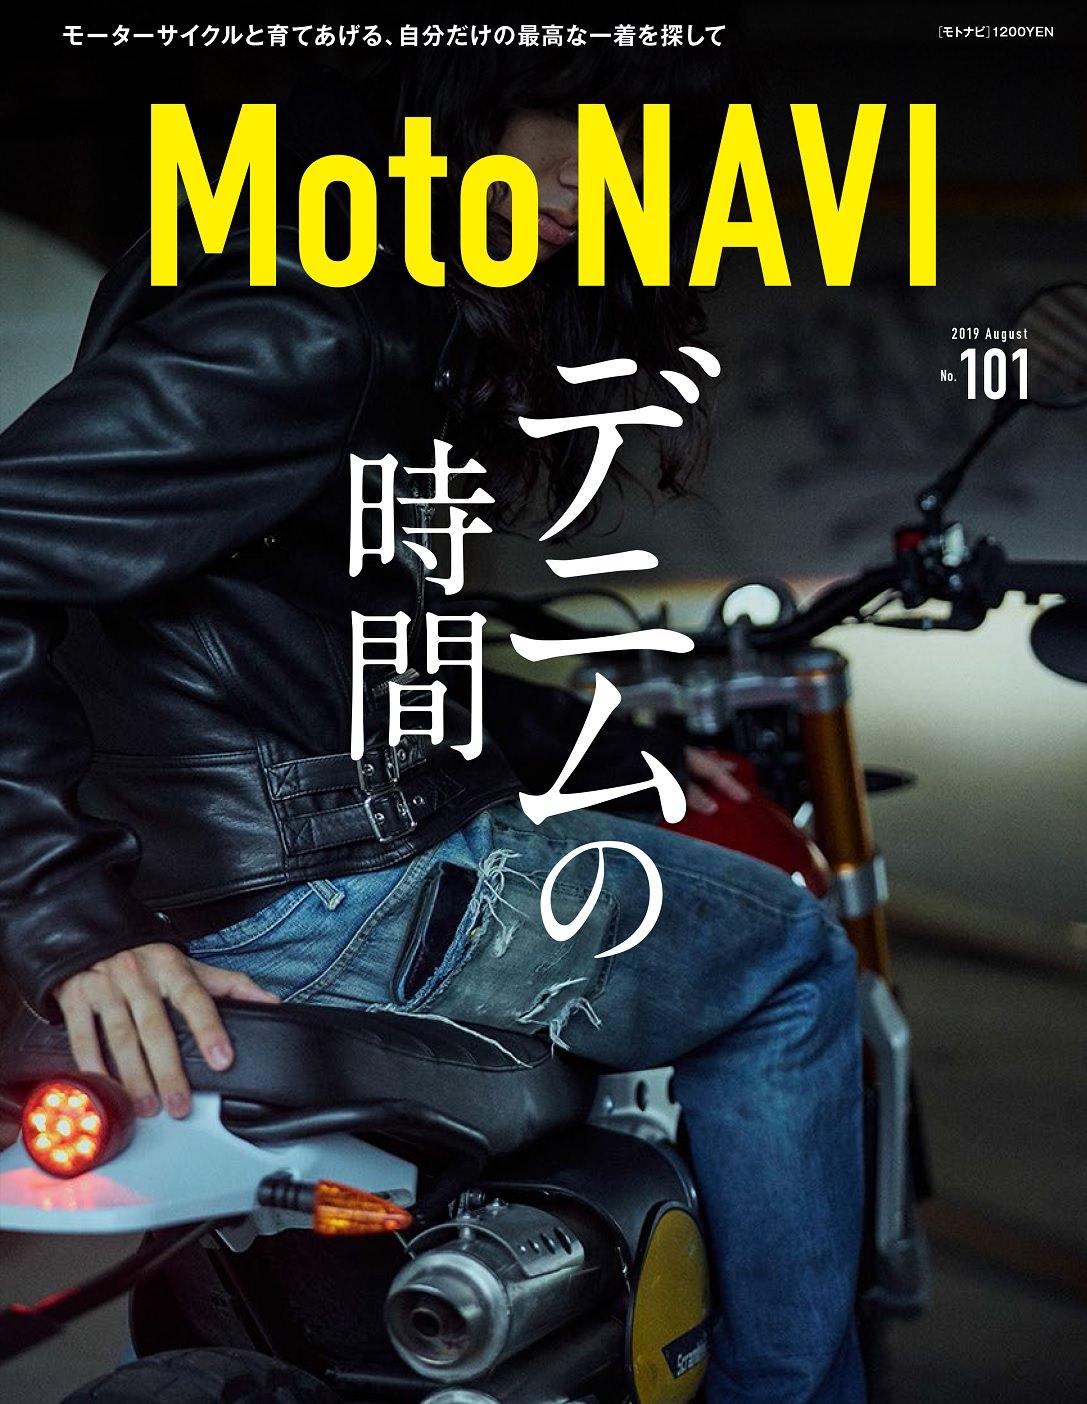 「Moto NAVI」 8月号にてHOMAが紹介されました。